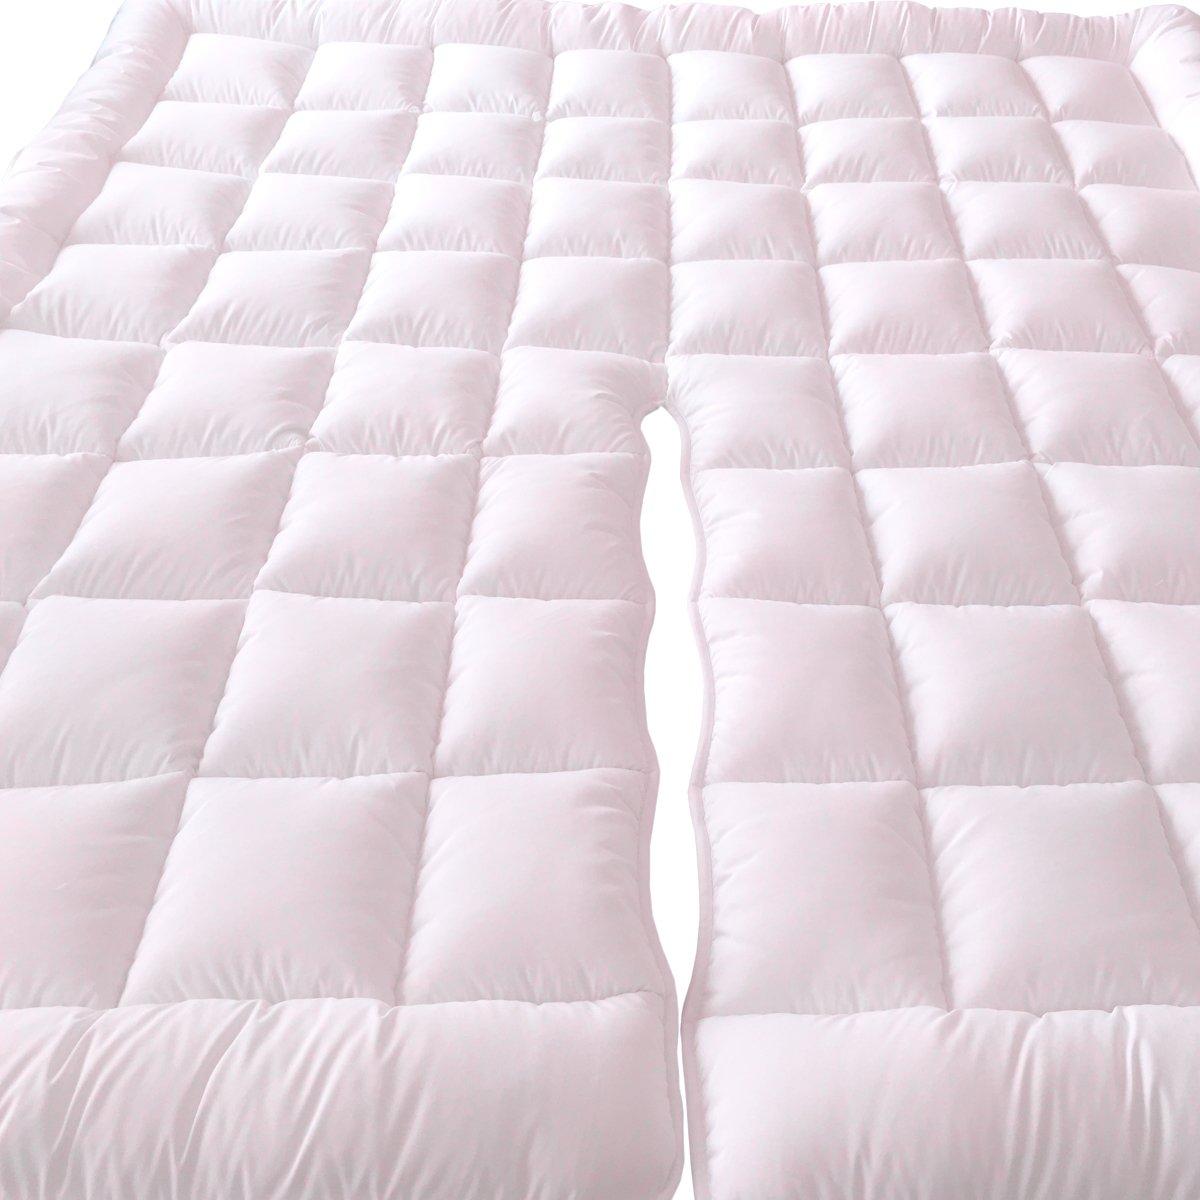 sheetsnthings 2'' Plush 100% Microfiber Top Split King Down Alternative Mattress Pad/Topper